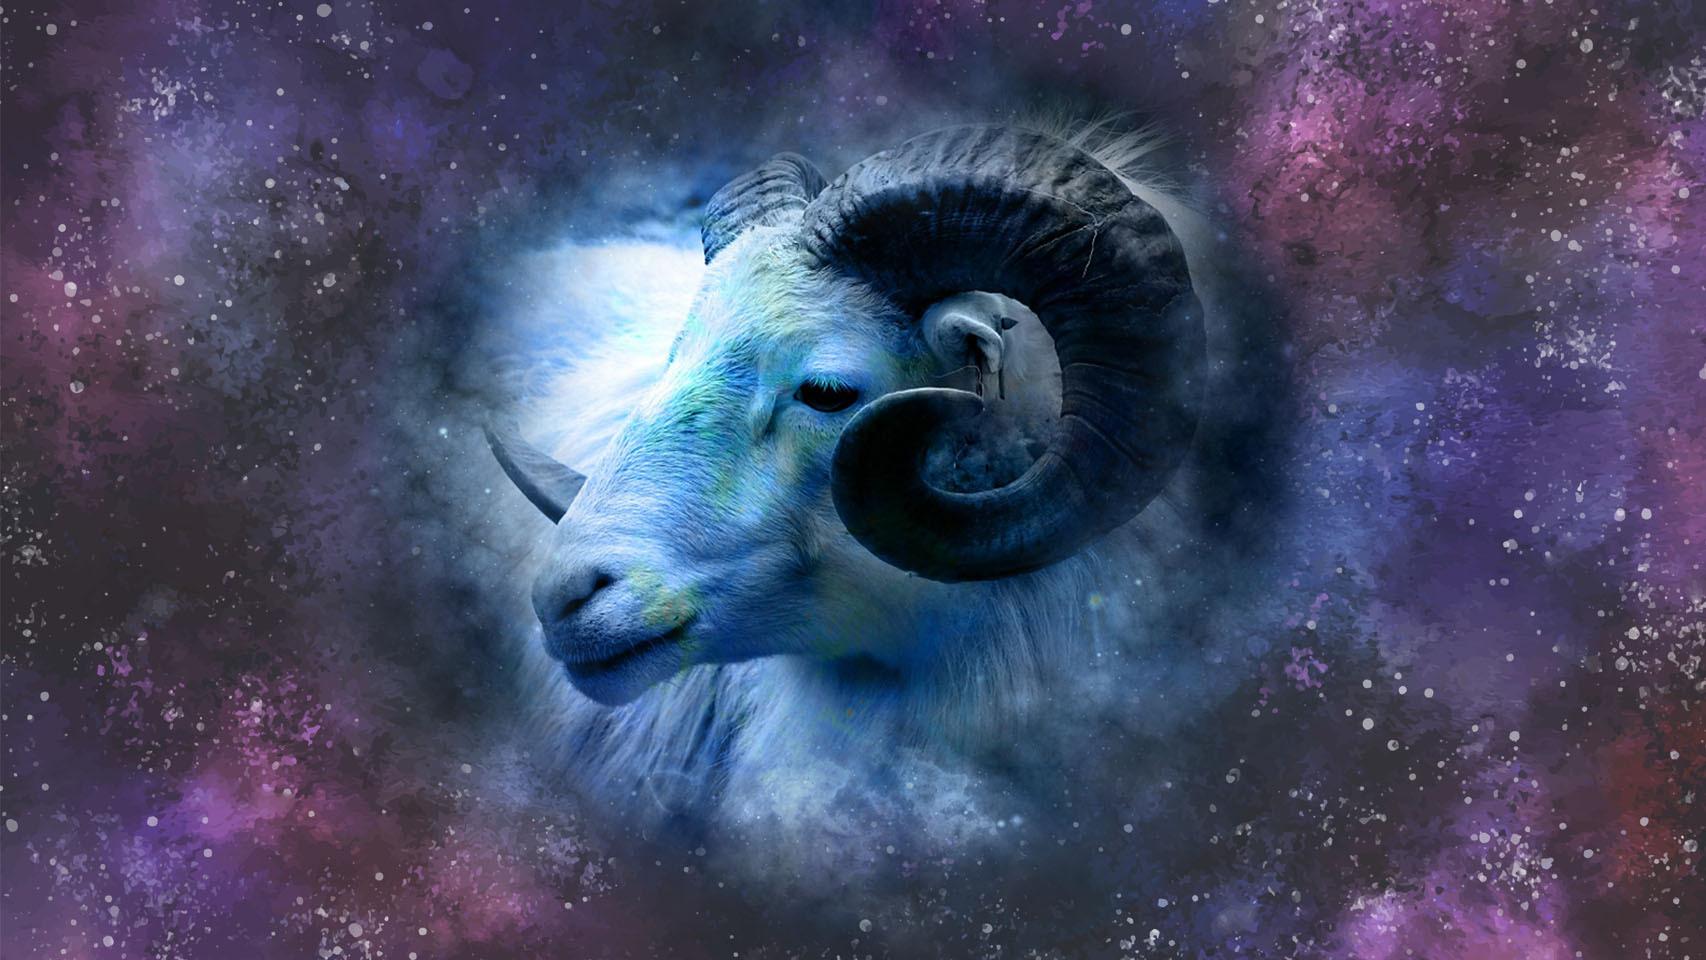 aries-zodiac-sign-compatibility-horoscope